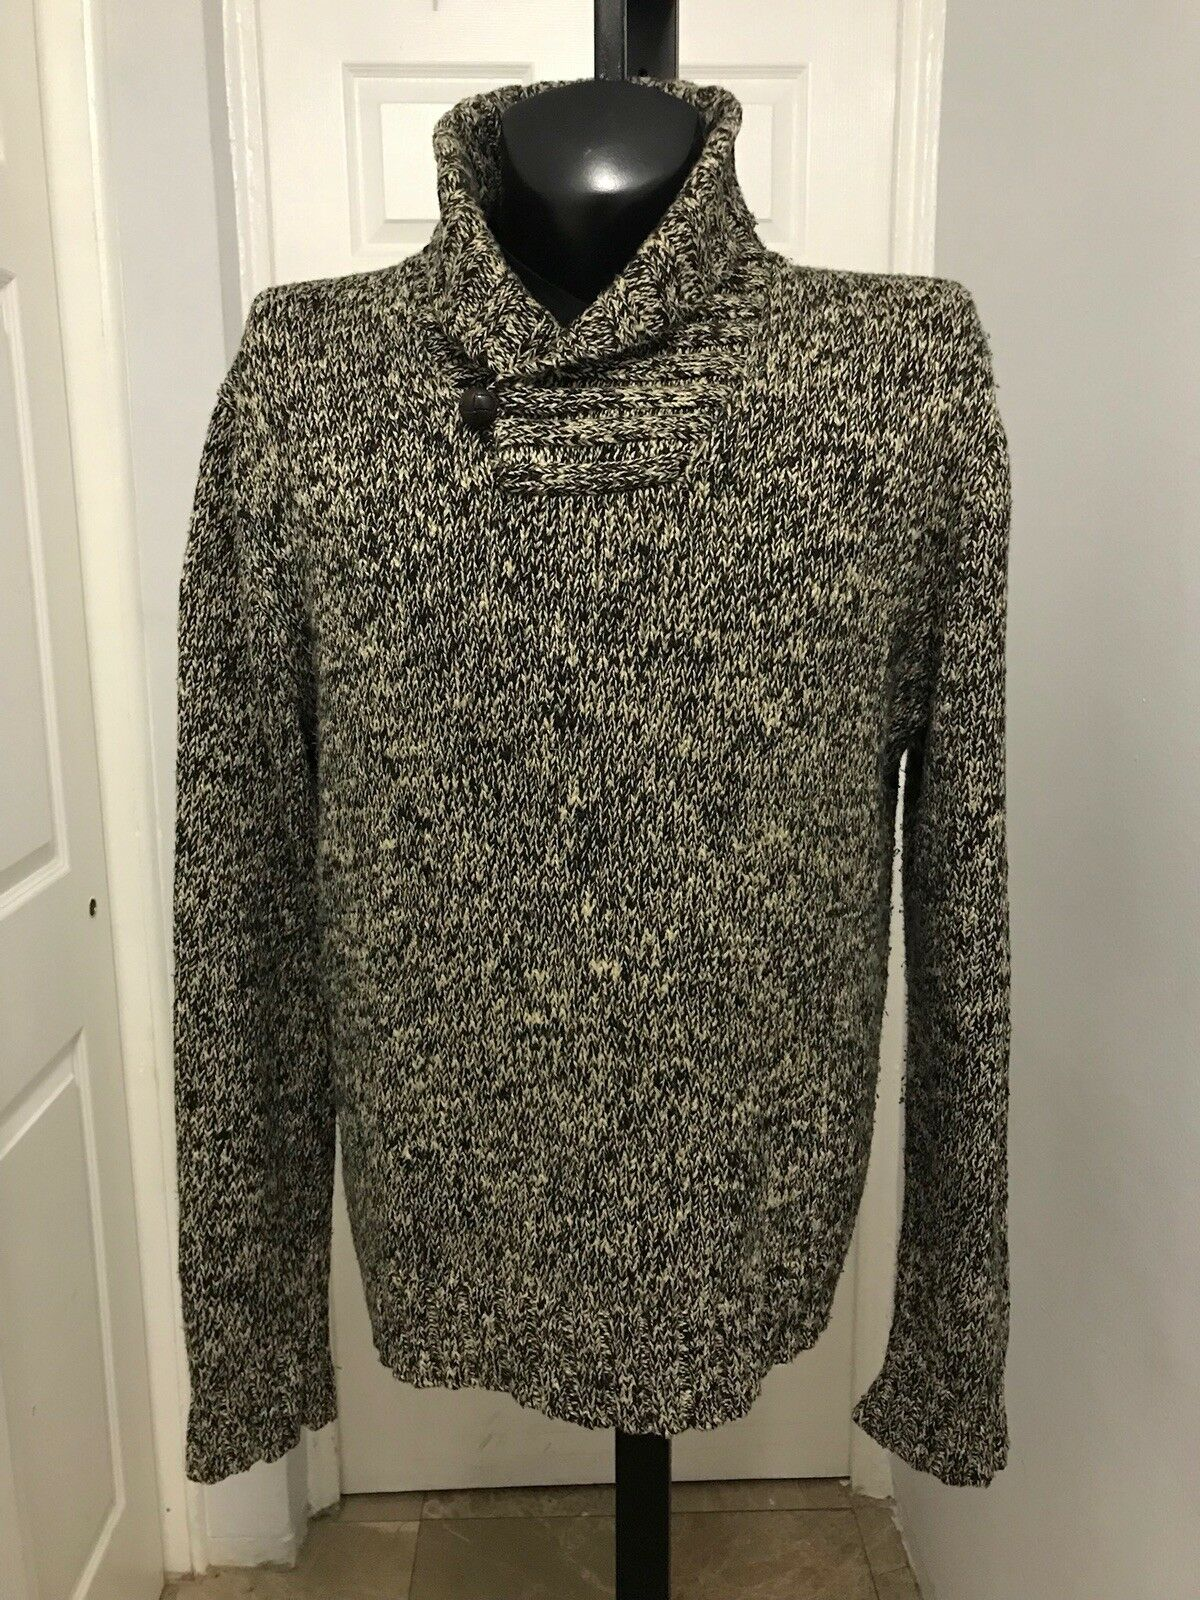 Polo Ralph Lauren shawl Mens Ski lodge flake shawl Sweater  XL leather button